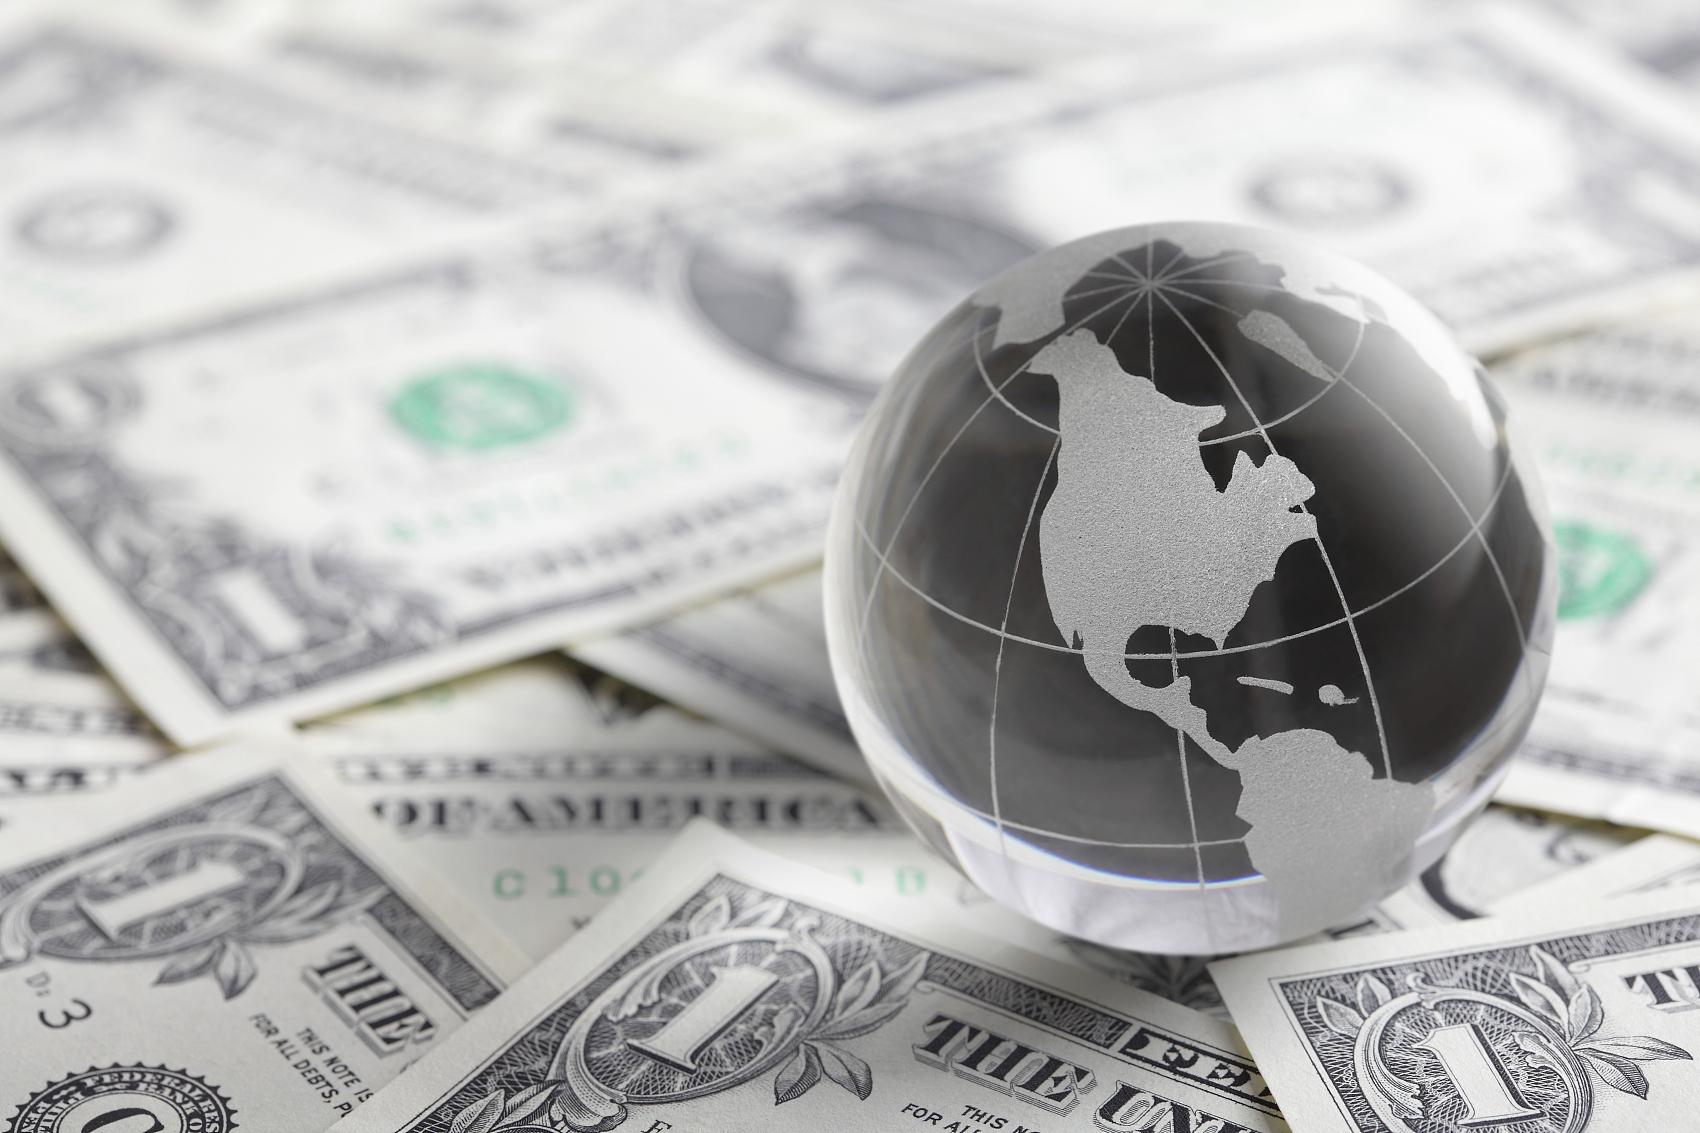 UBS predicts U.S. dollar to depreciate in 2019